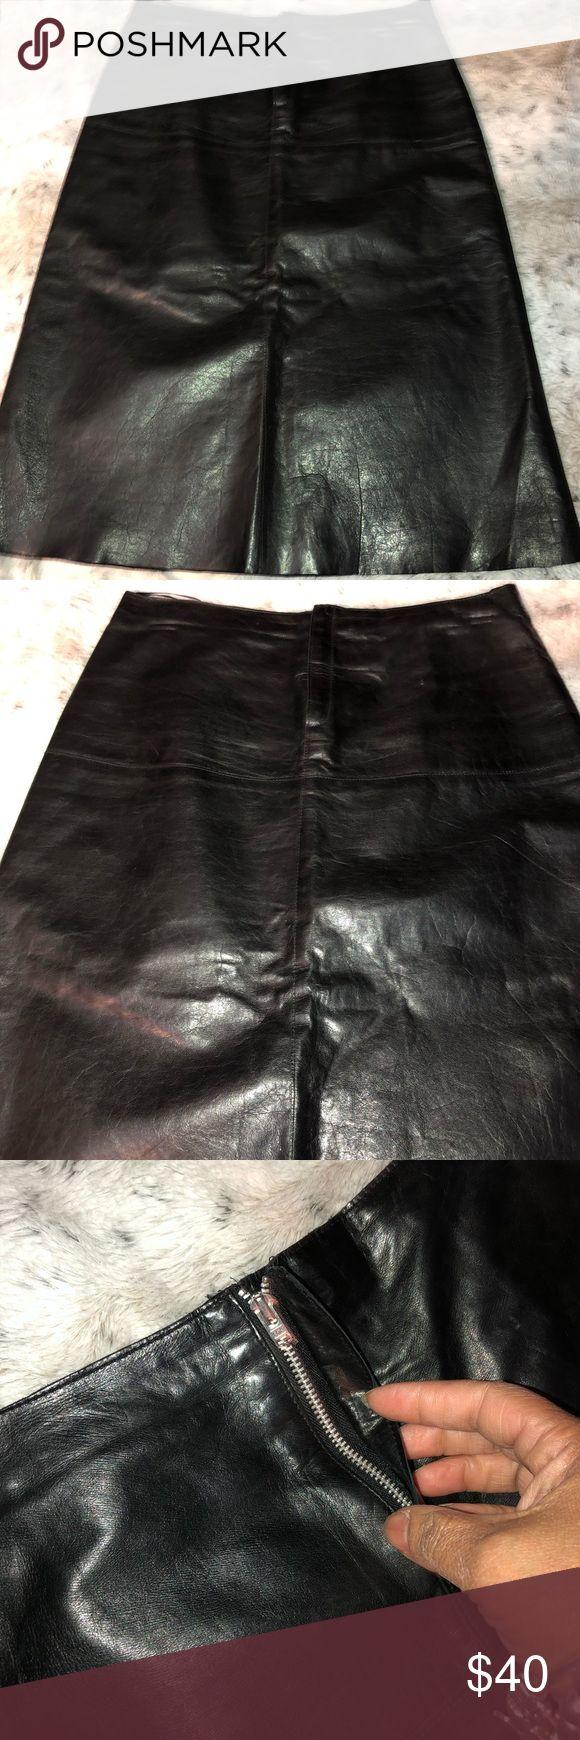 Banana republic leather skirt Black leather skirt  Size 0